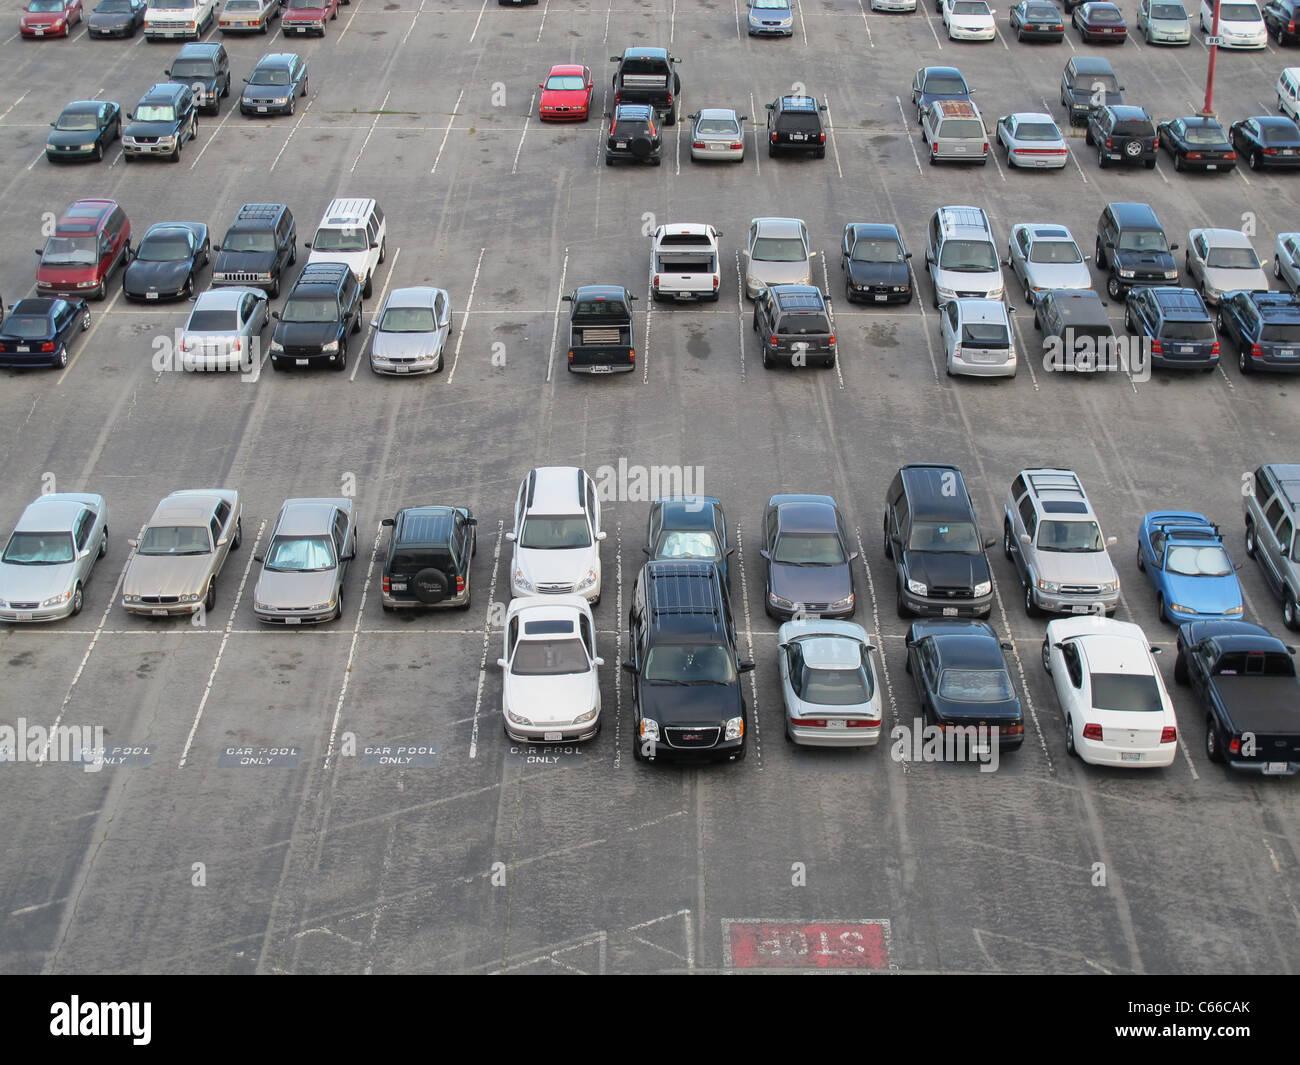 San francisco airport parking discount coupons